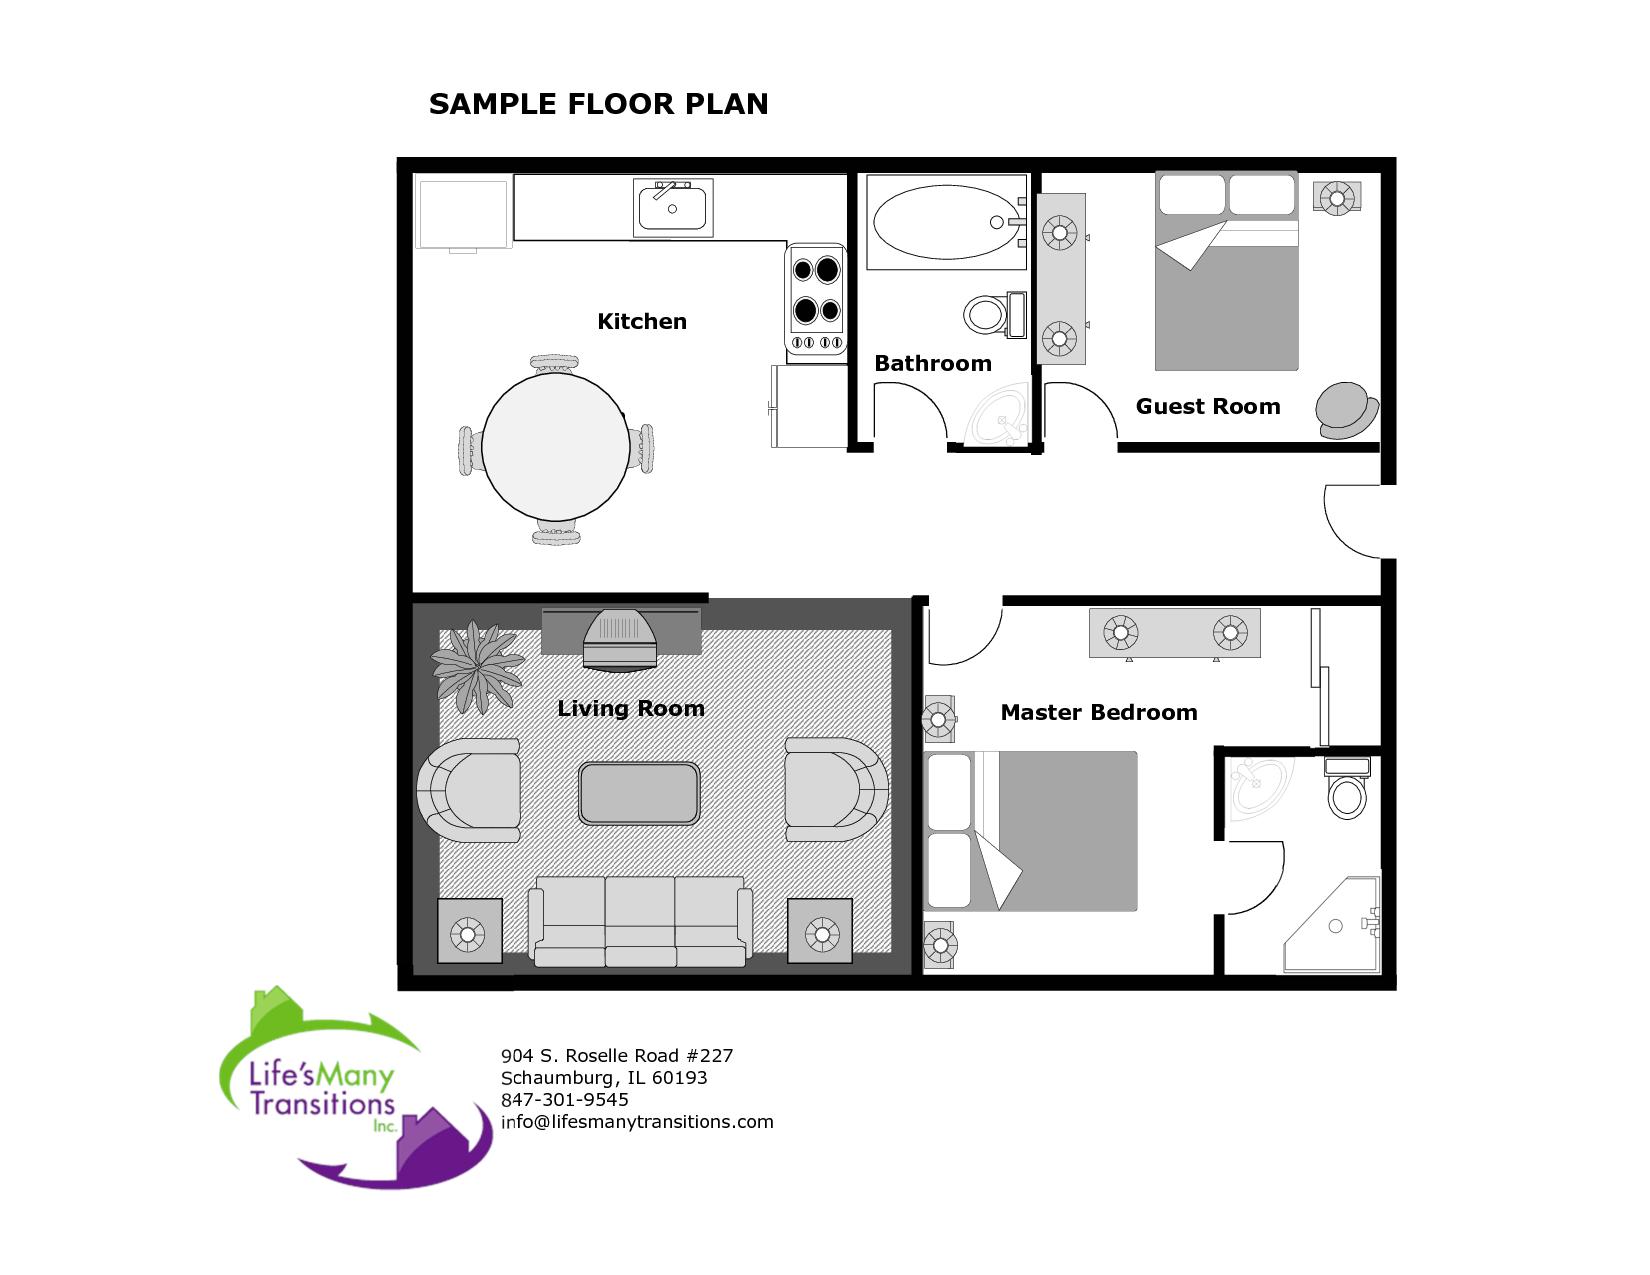 Design Online Room Planner Free Apartments Apartment Ideas For Furniture Decor Living Bathroom Floor Plans Kitchen Floor Plans Small Bathroom Floor Plans